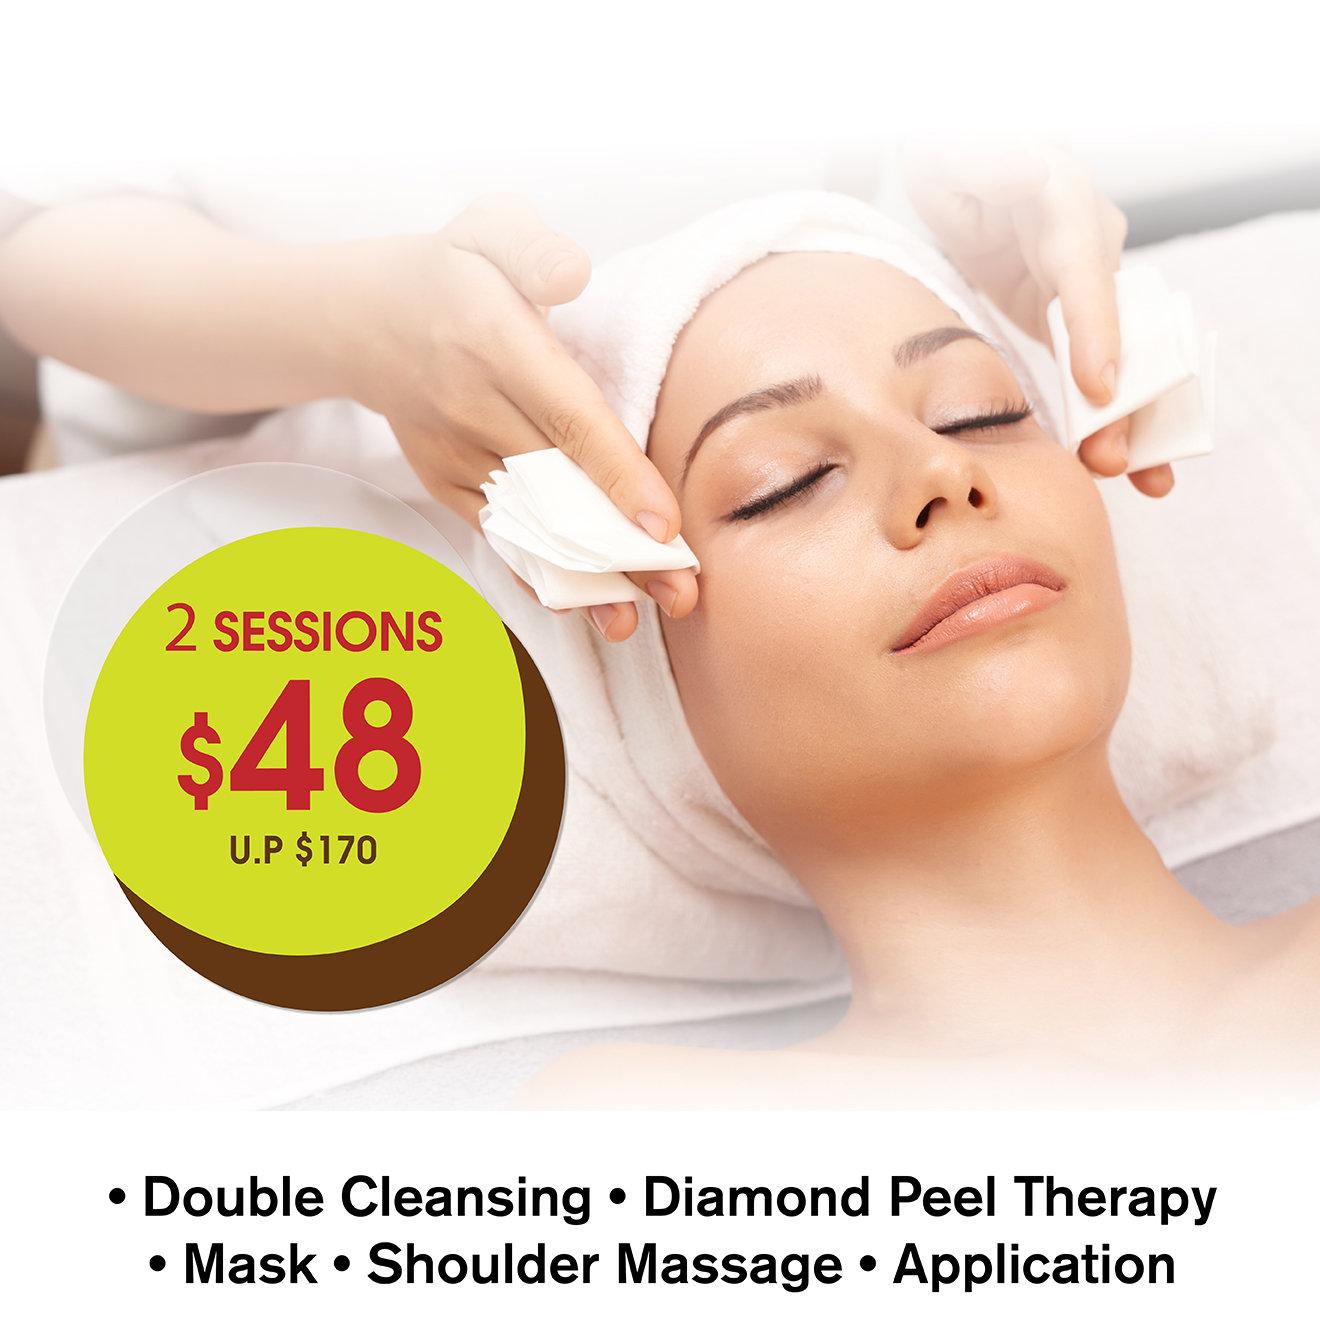 Diamond Peel Therapy